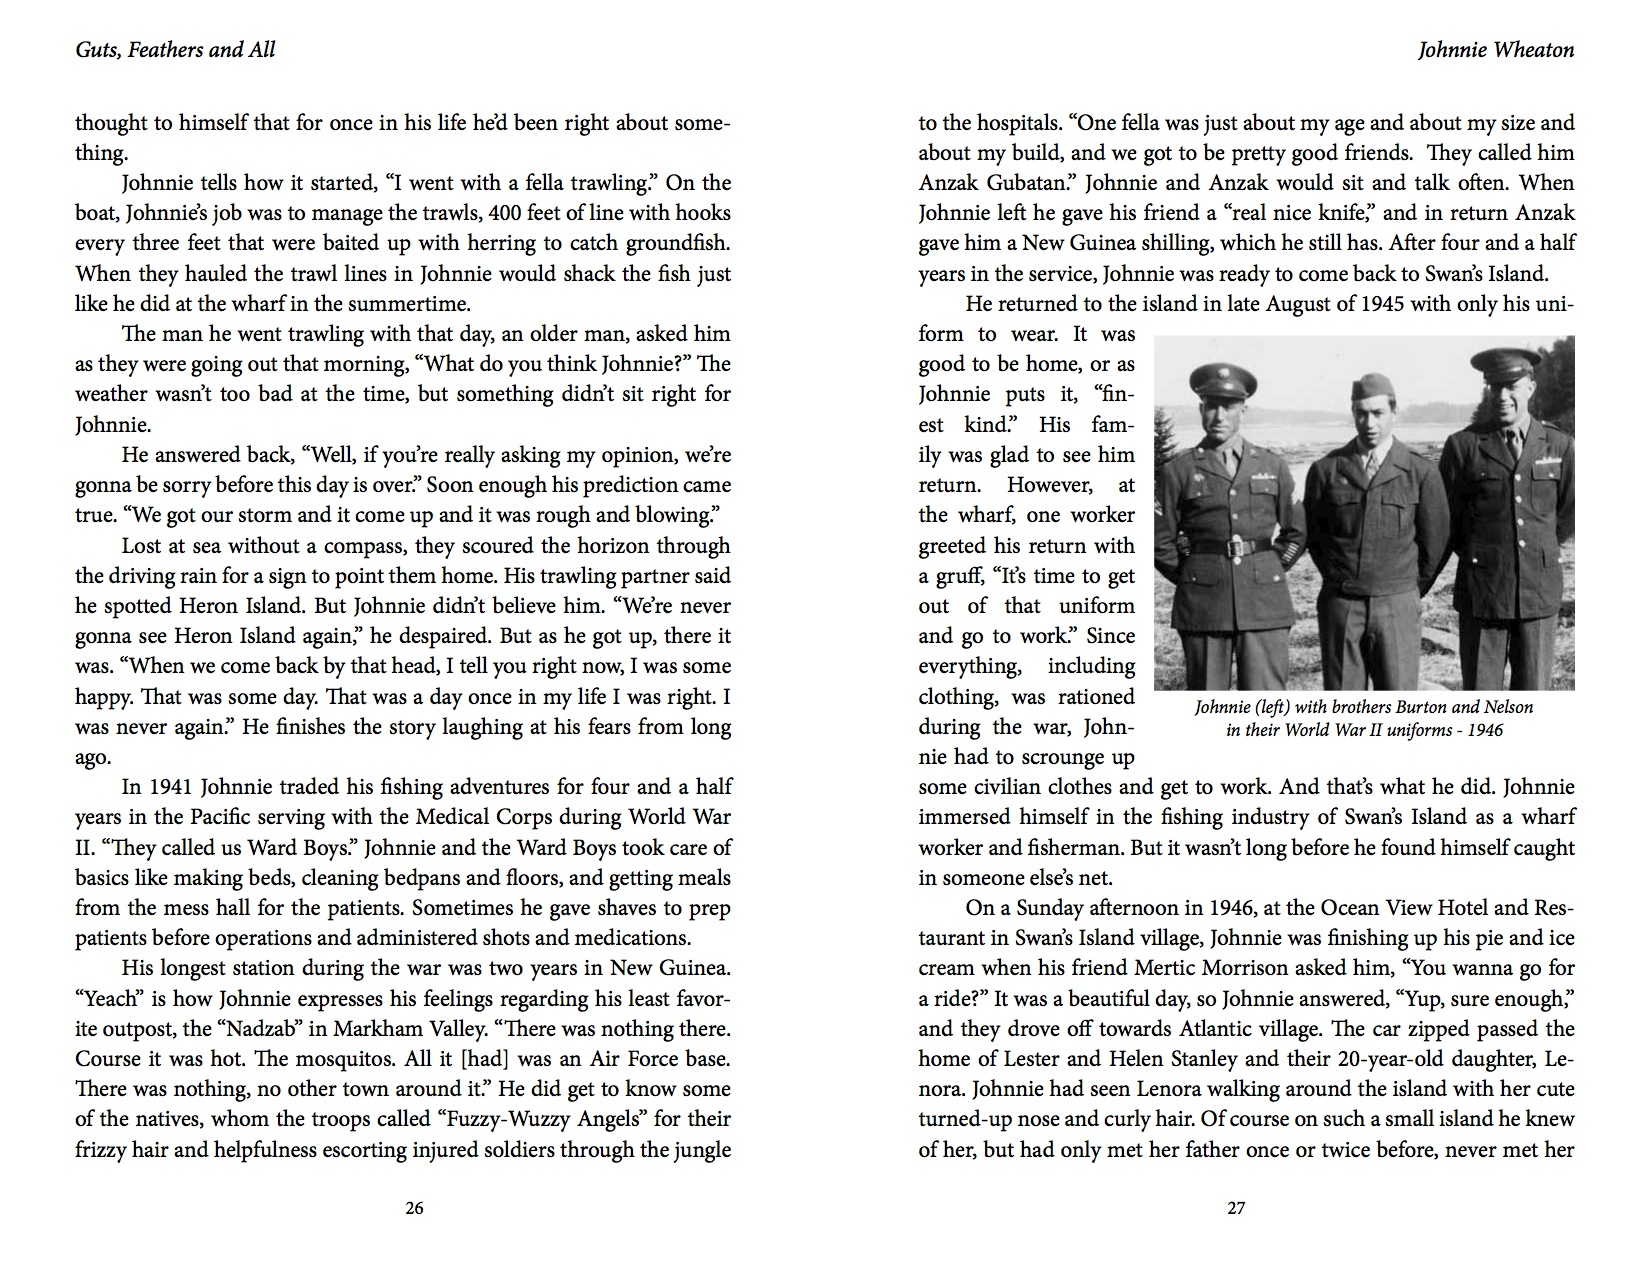 Johnnie W page 3.jpg